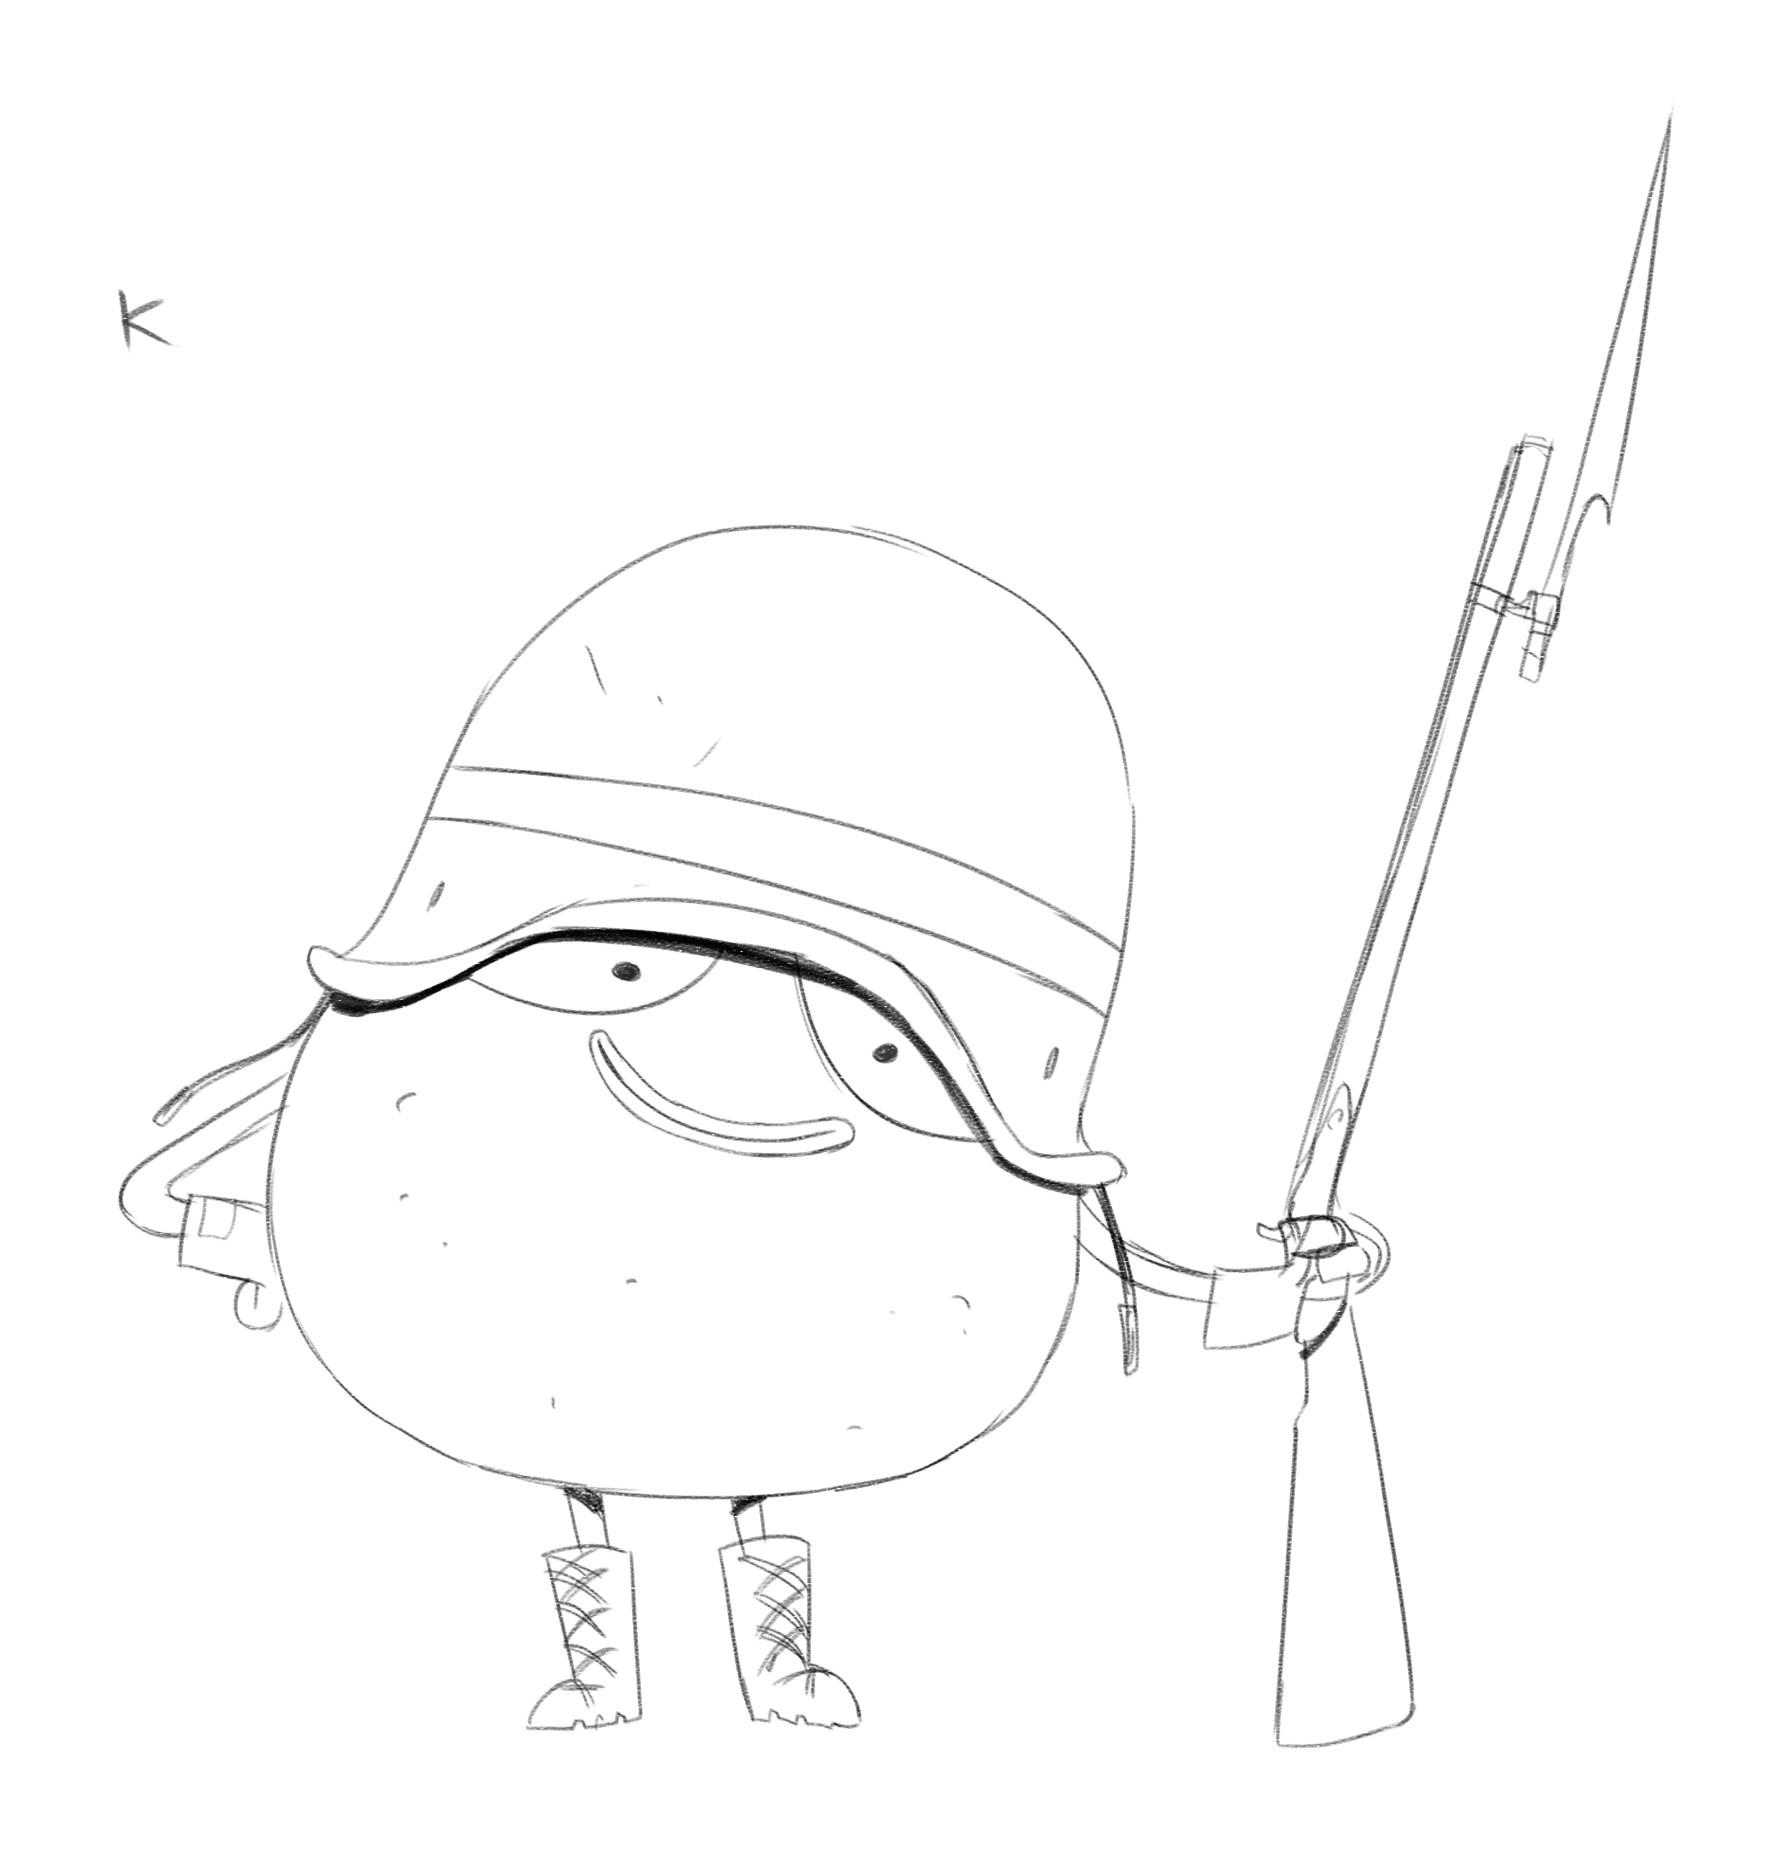 Rayner alencar k avocado soldier